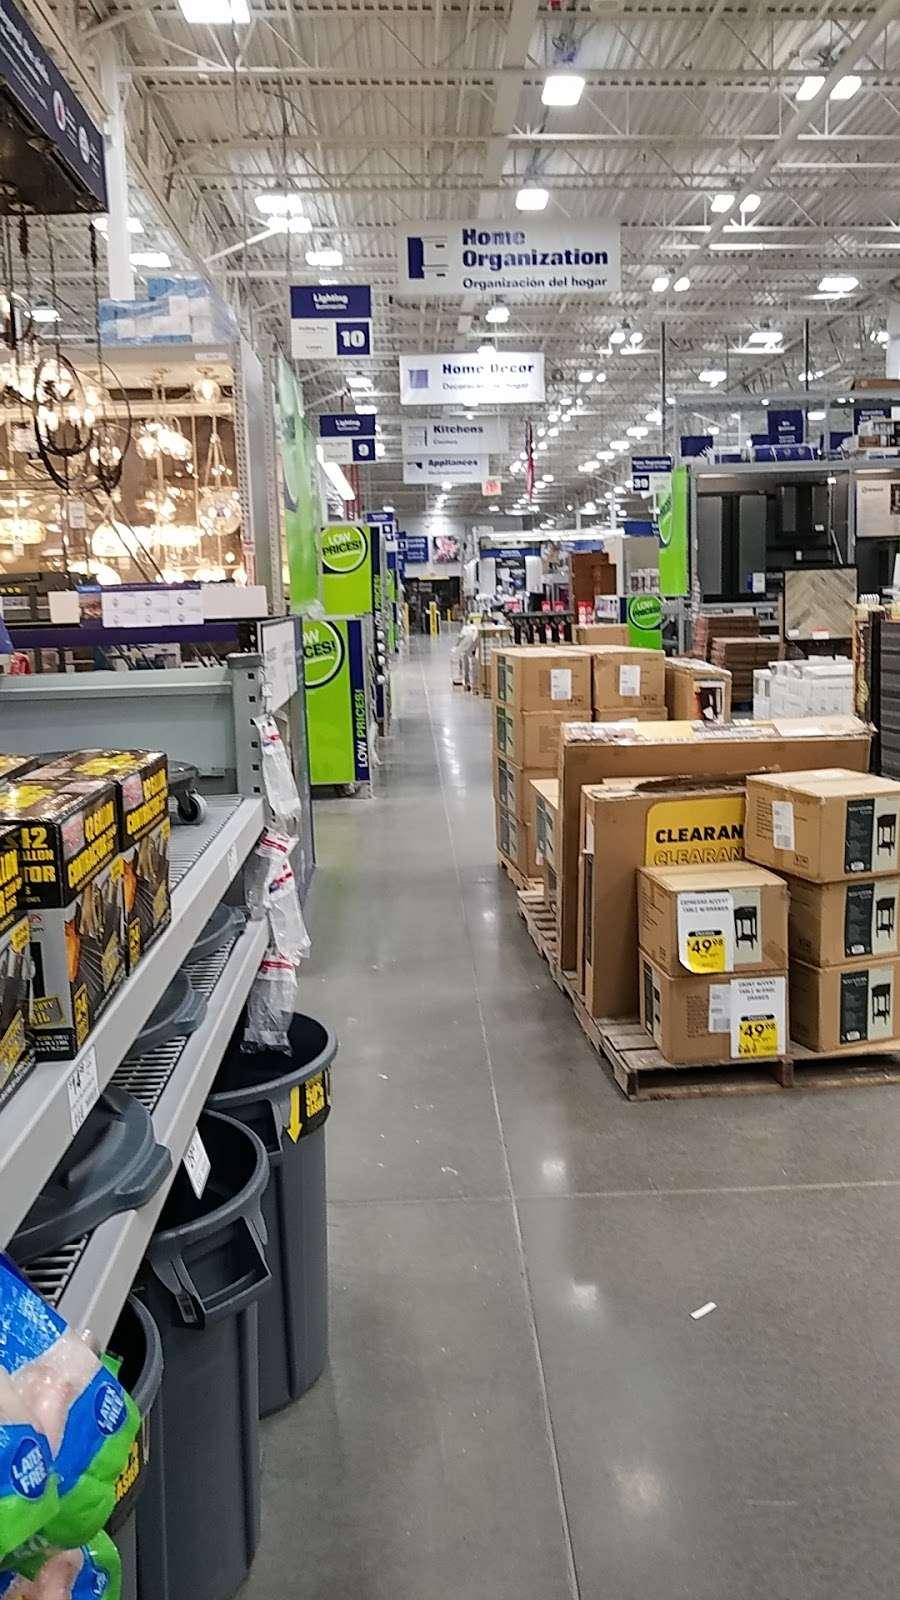 Lowes Home Improvement - hardware store    Photo 8 of 10   Address: 485 Berlin - Cross Keys Rd, Sicklerville, NJ 08081, USA   Phone: (856) 237-2030